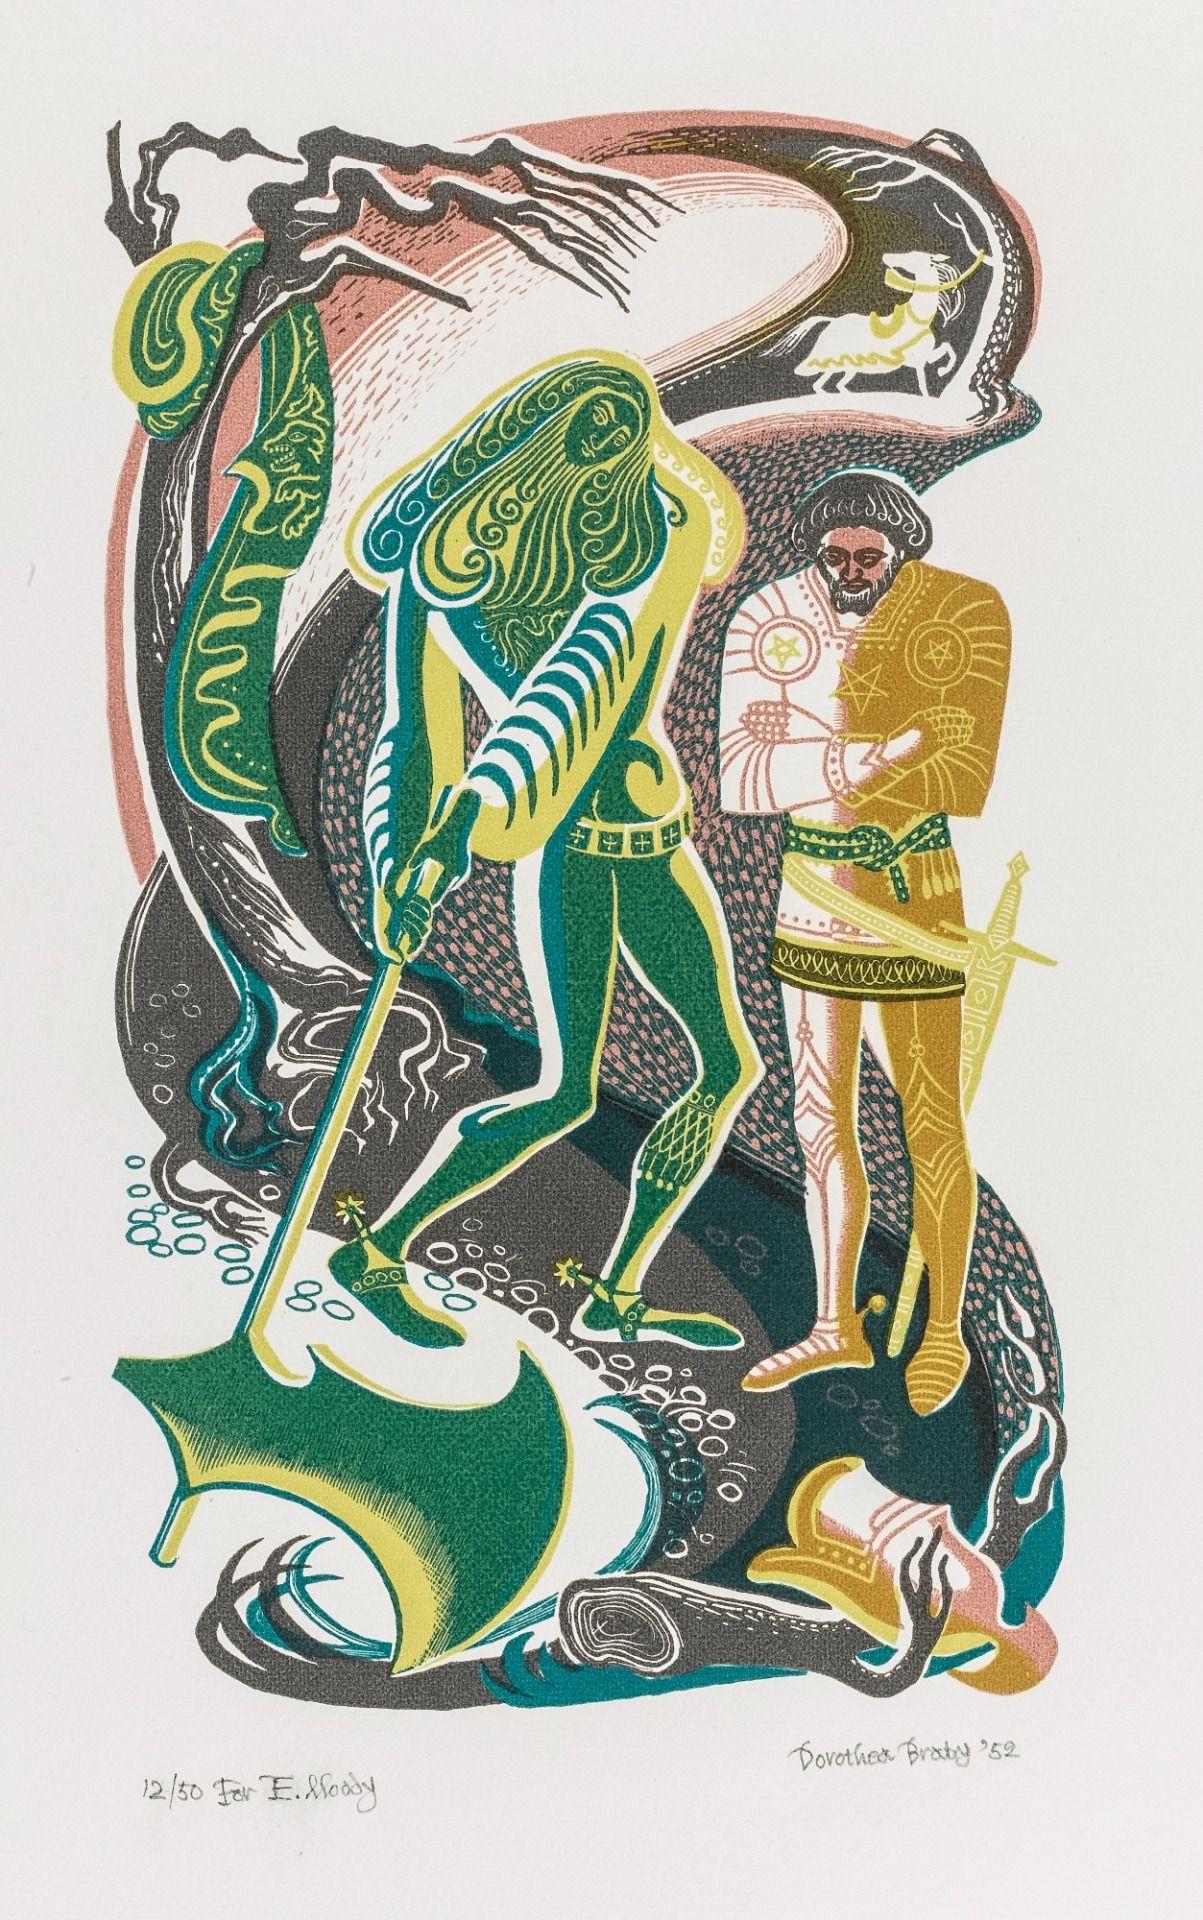 d881e943 Illustration by Dorothea Braby for Gwyn Jones' translation of